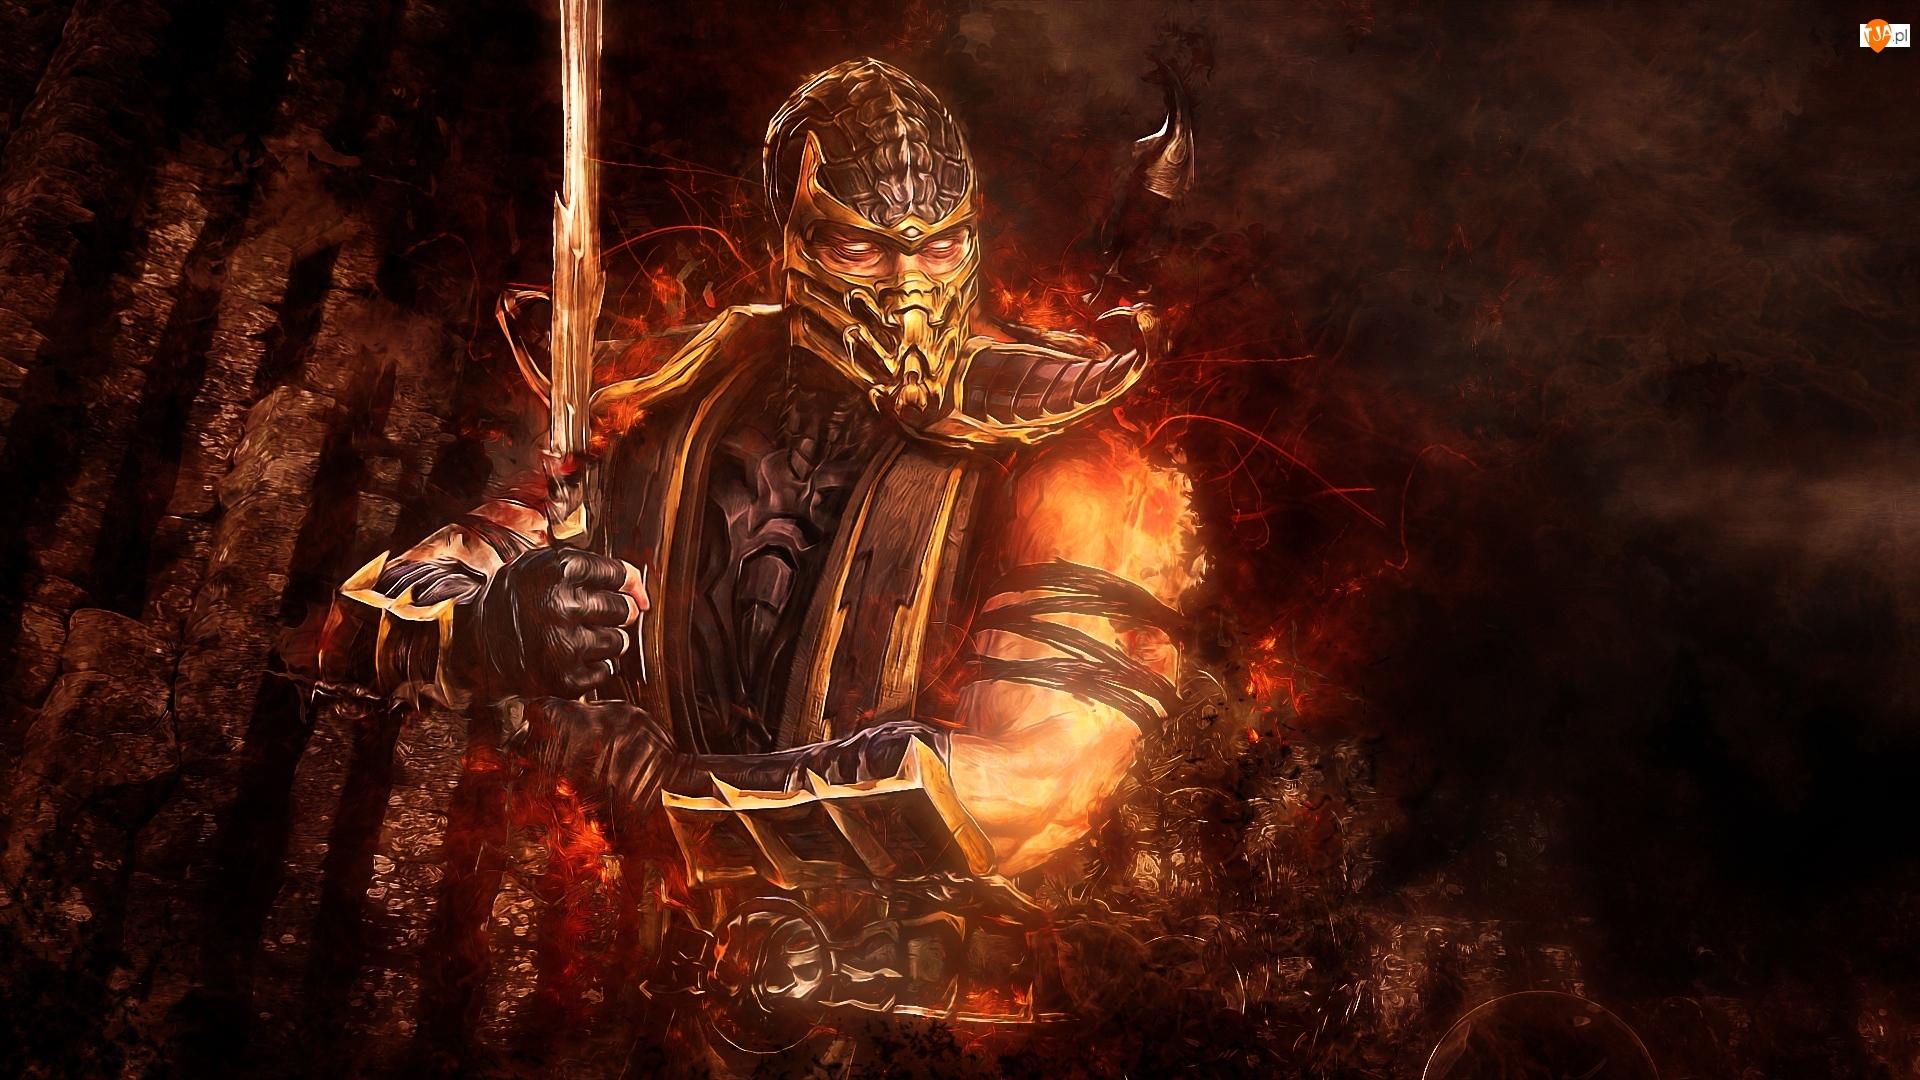 Scorpion, Gra, Mortal Kombat, Postać